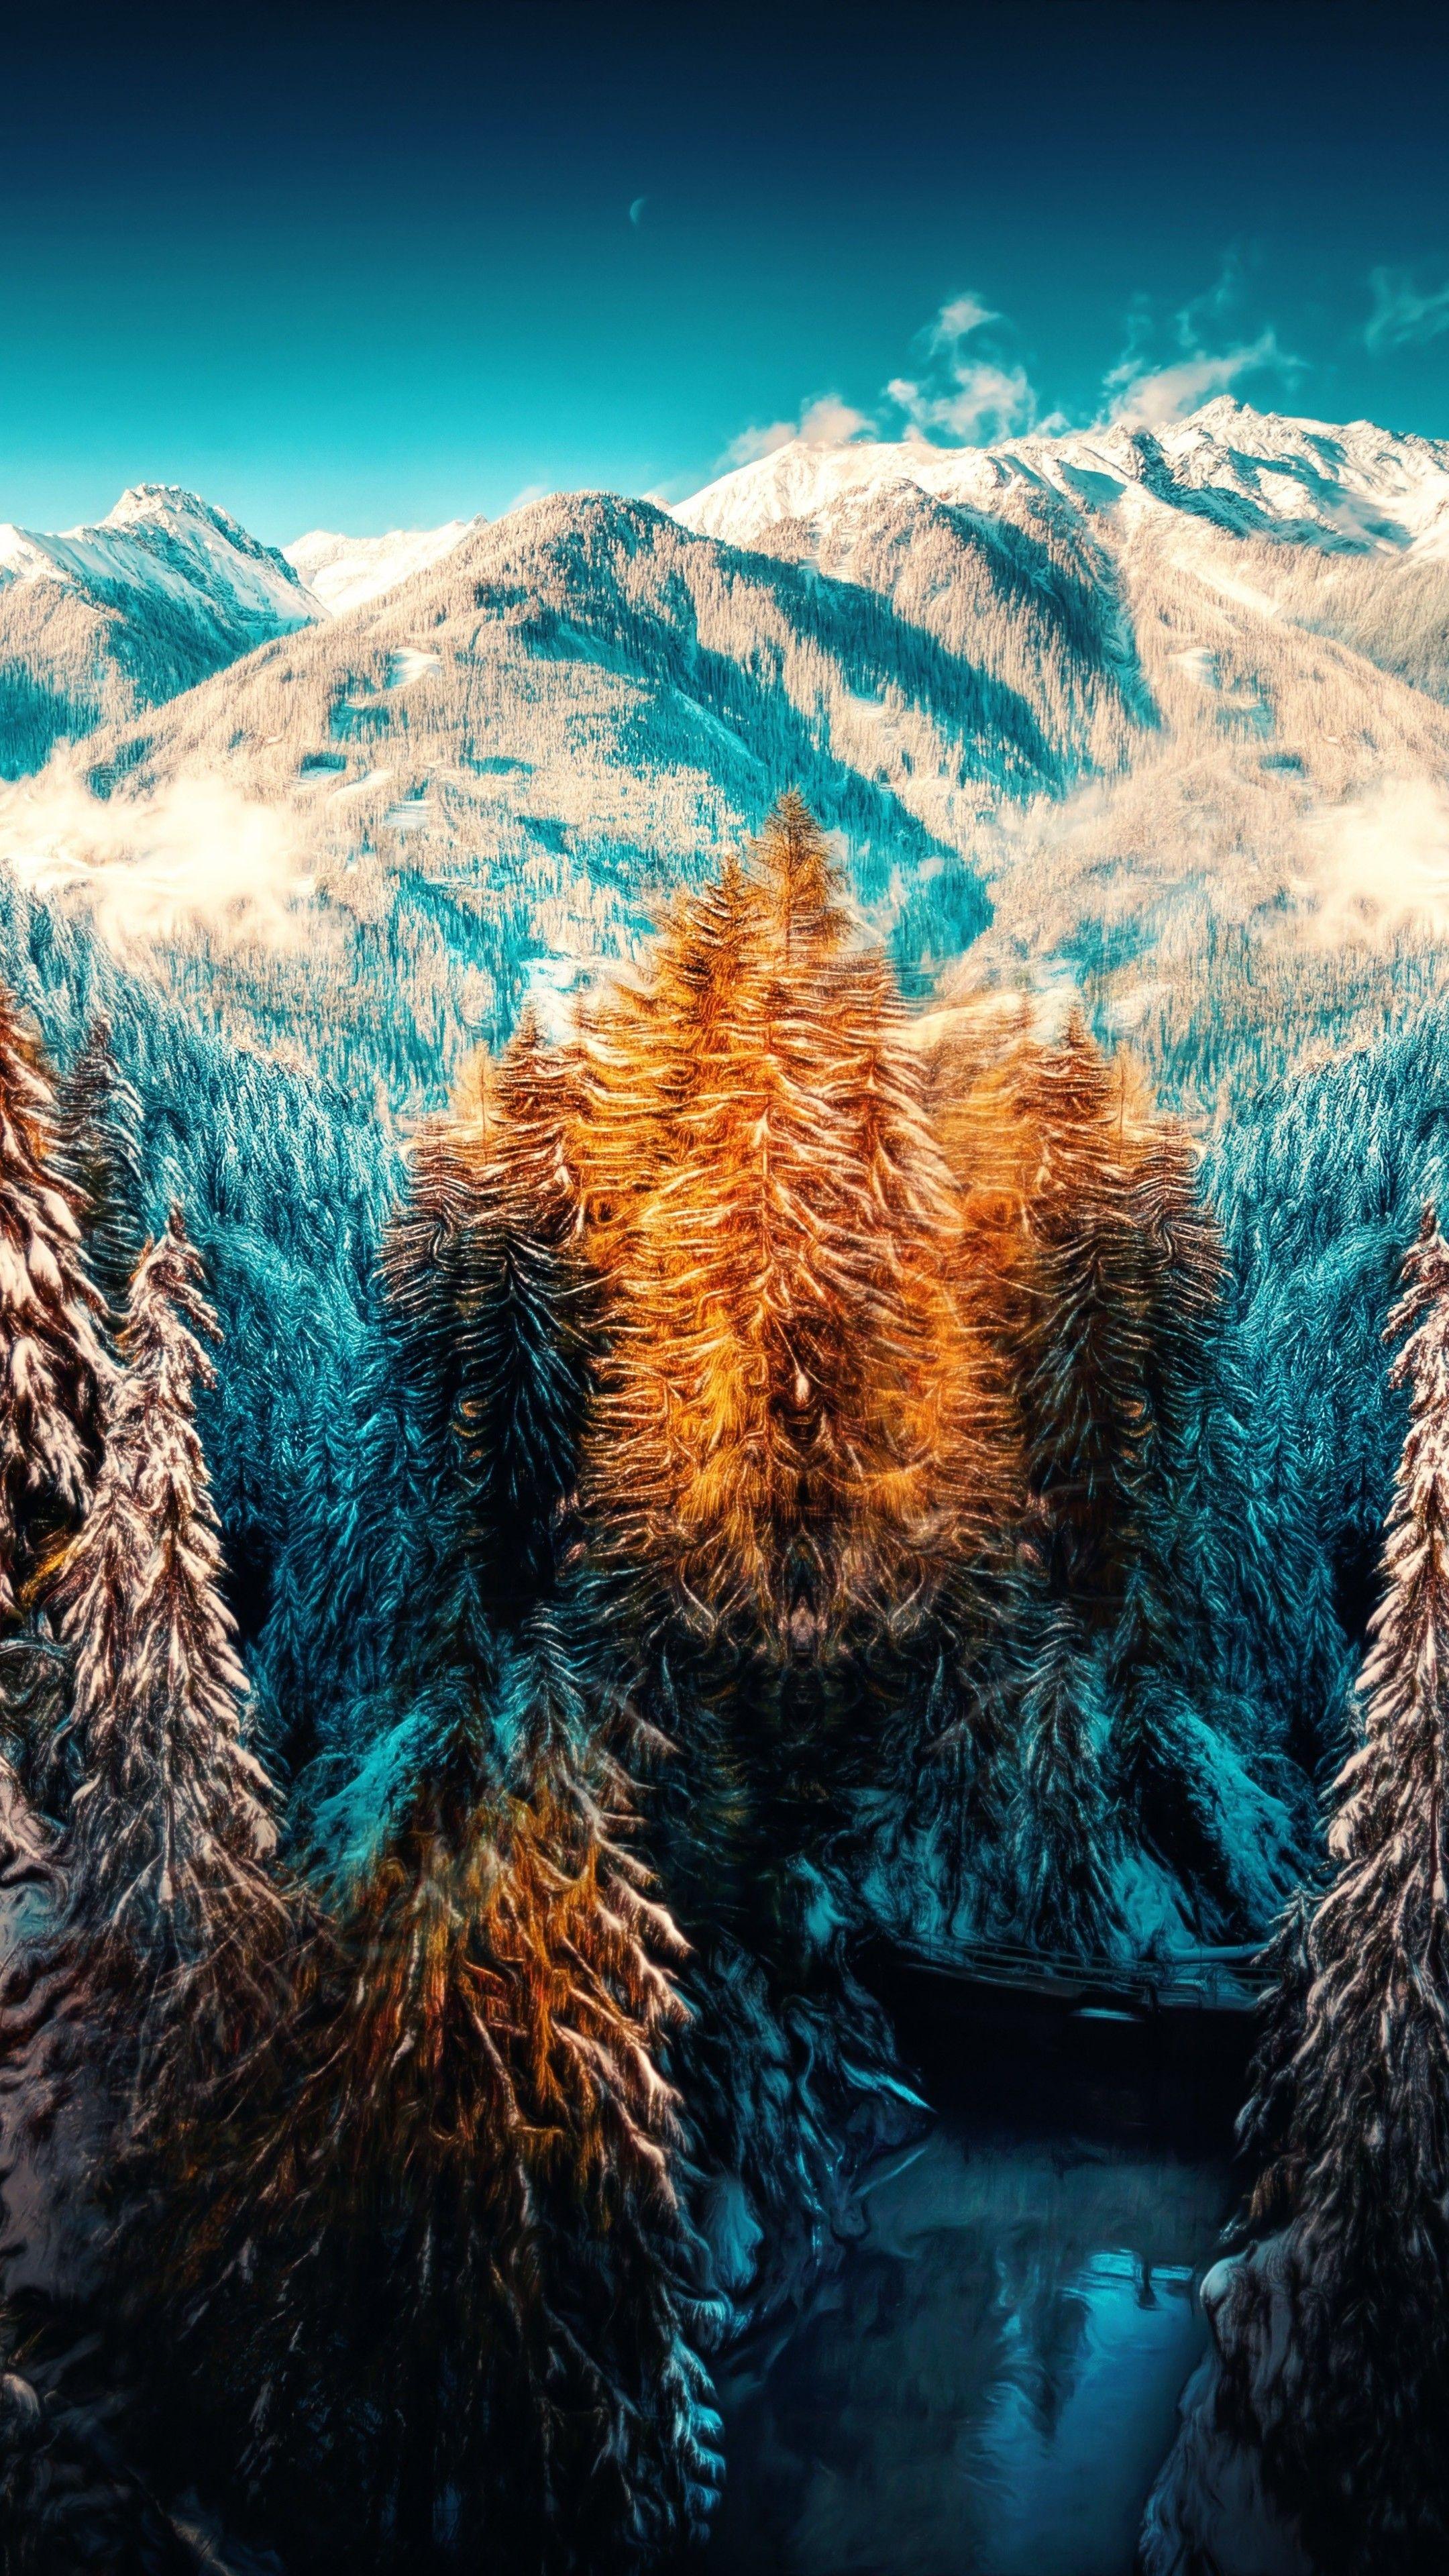 Nature Snow Landscape Mountains Trees Forest 5k